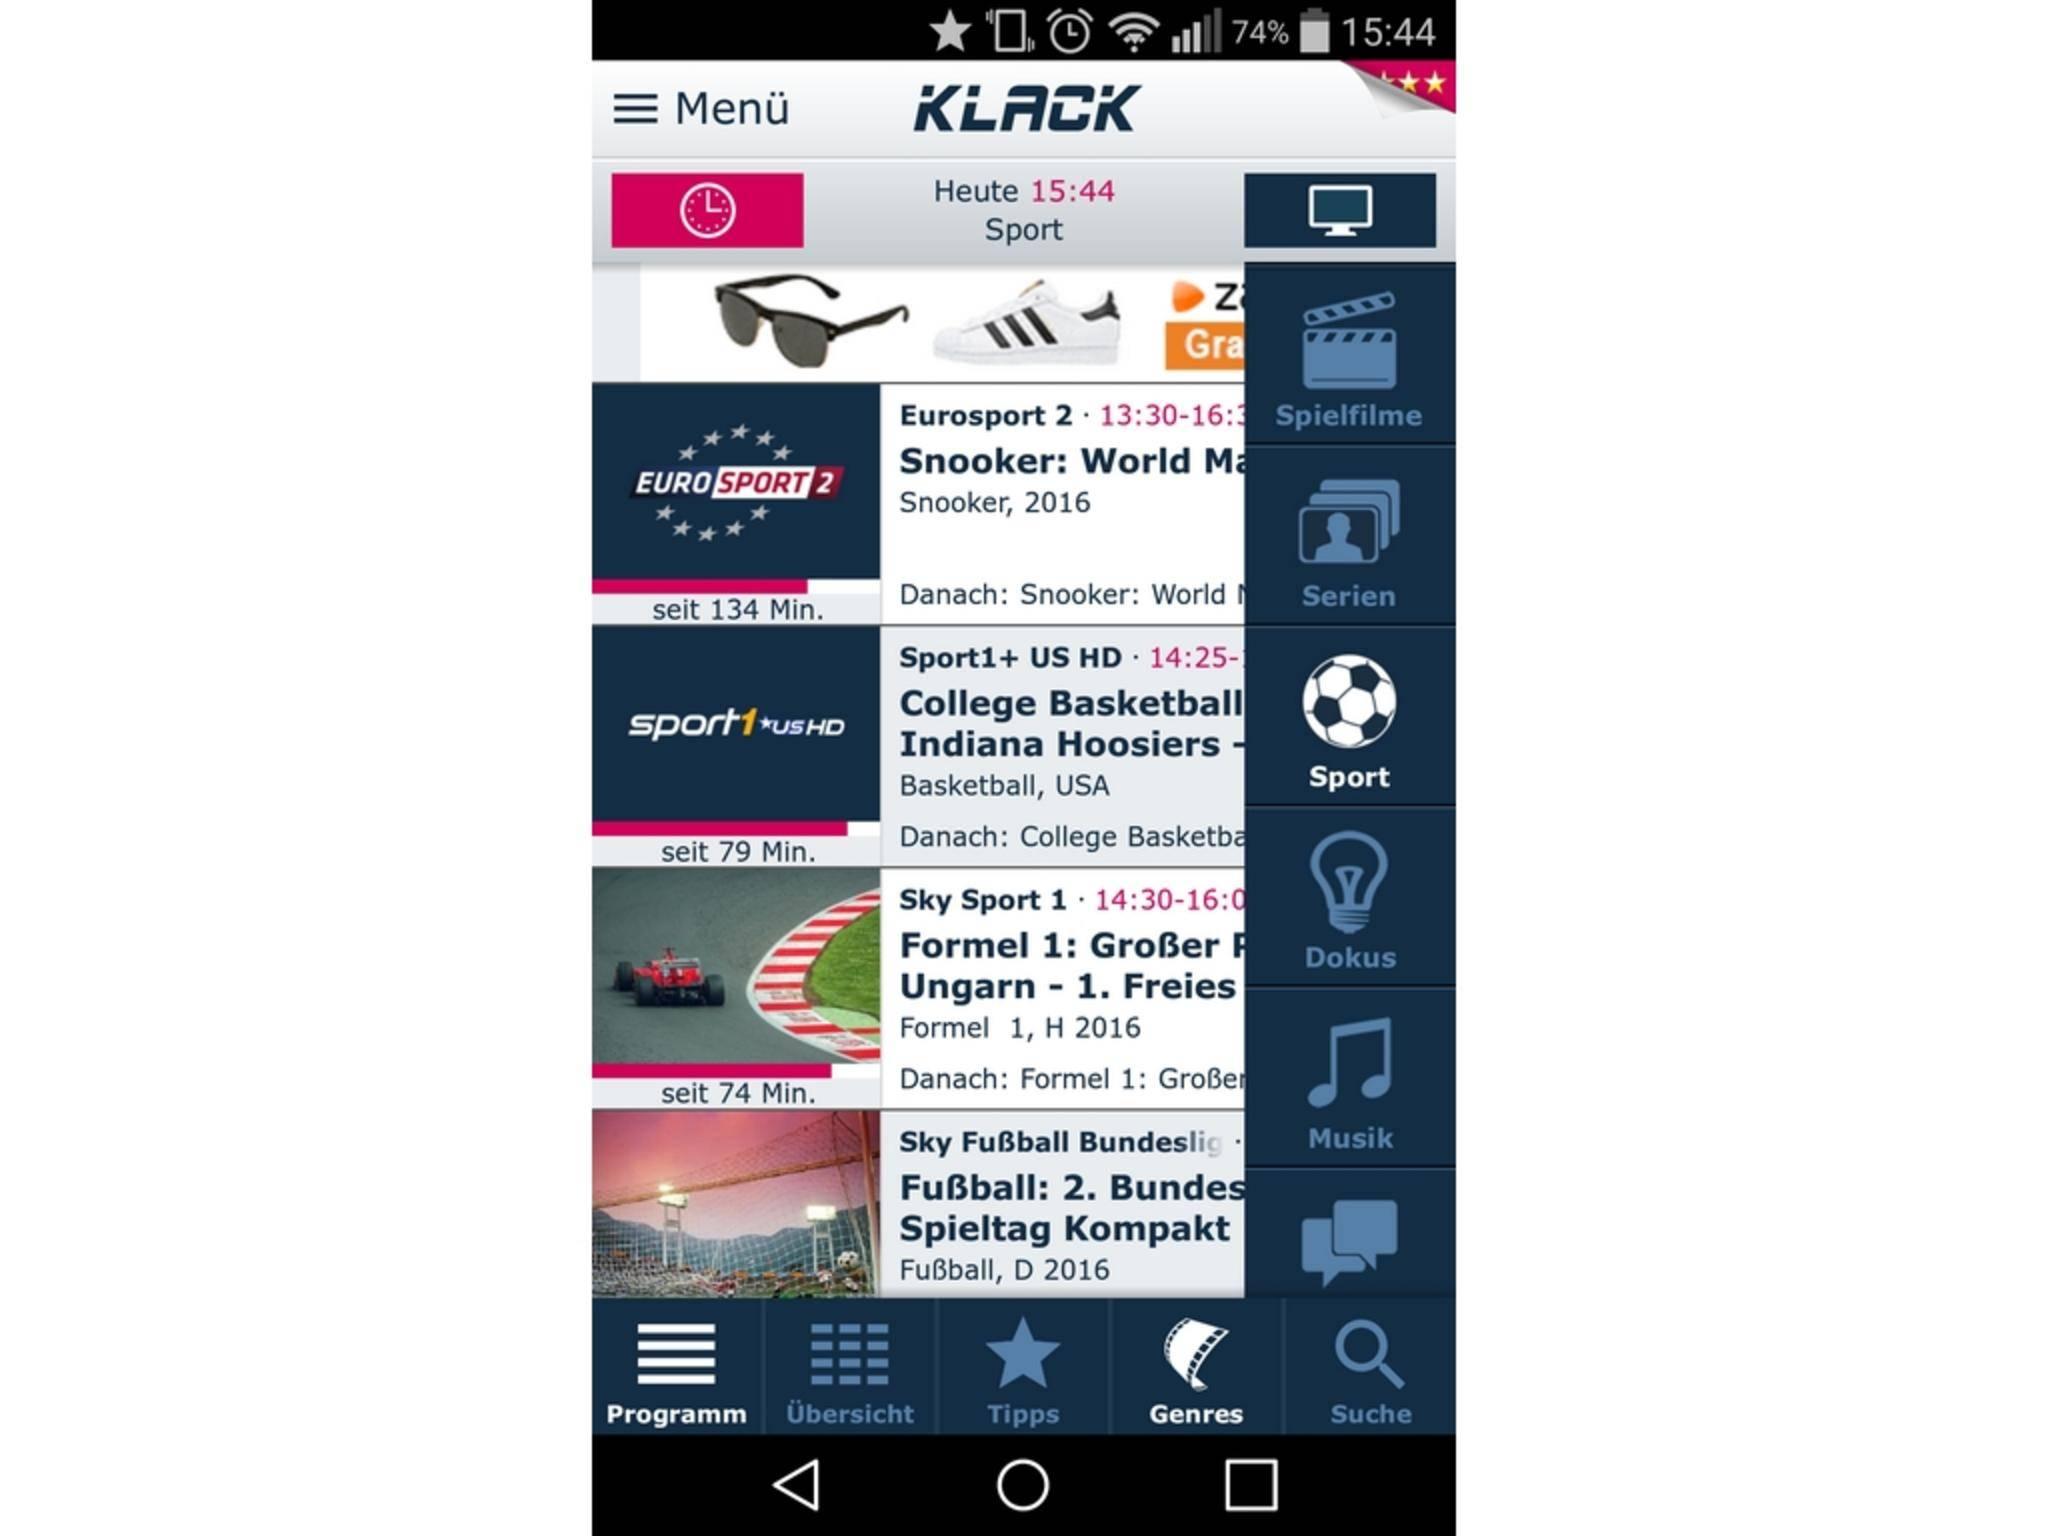 Klack02